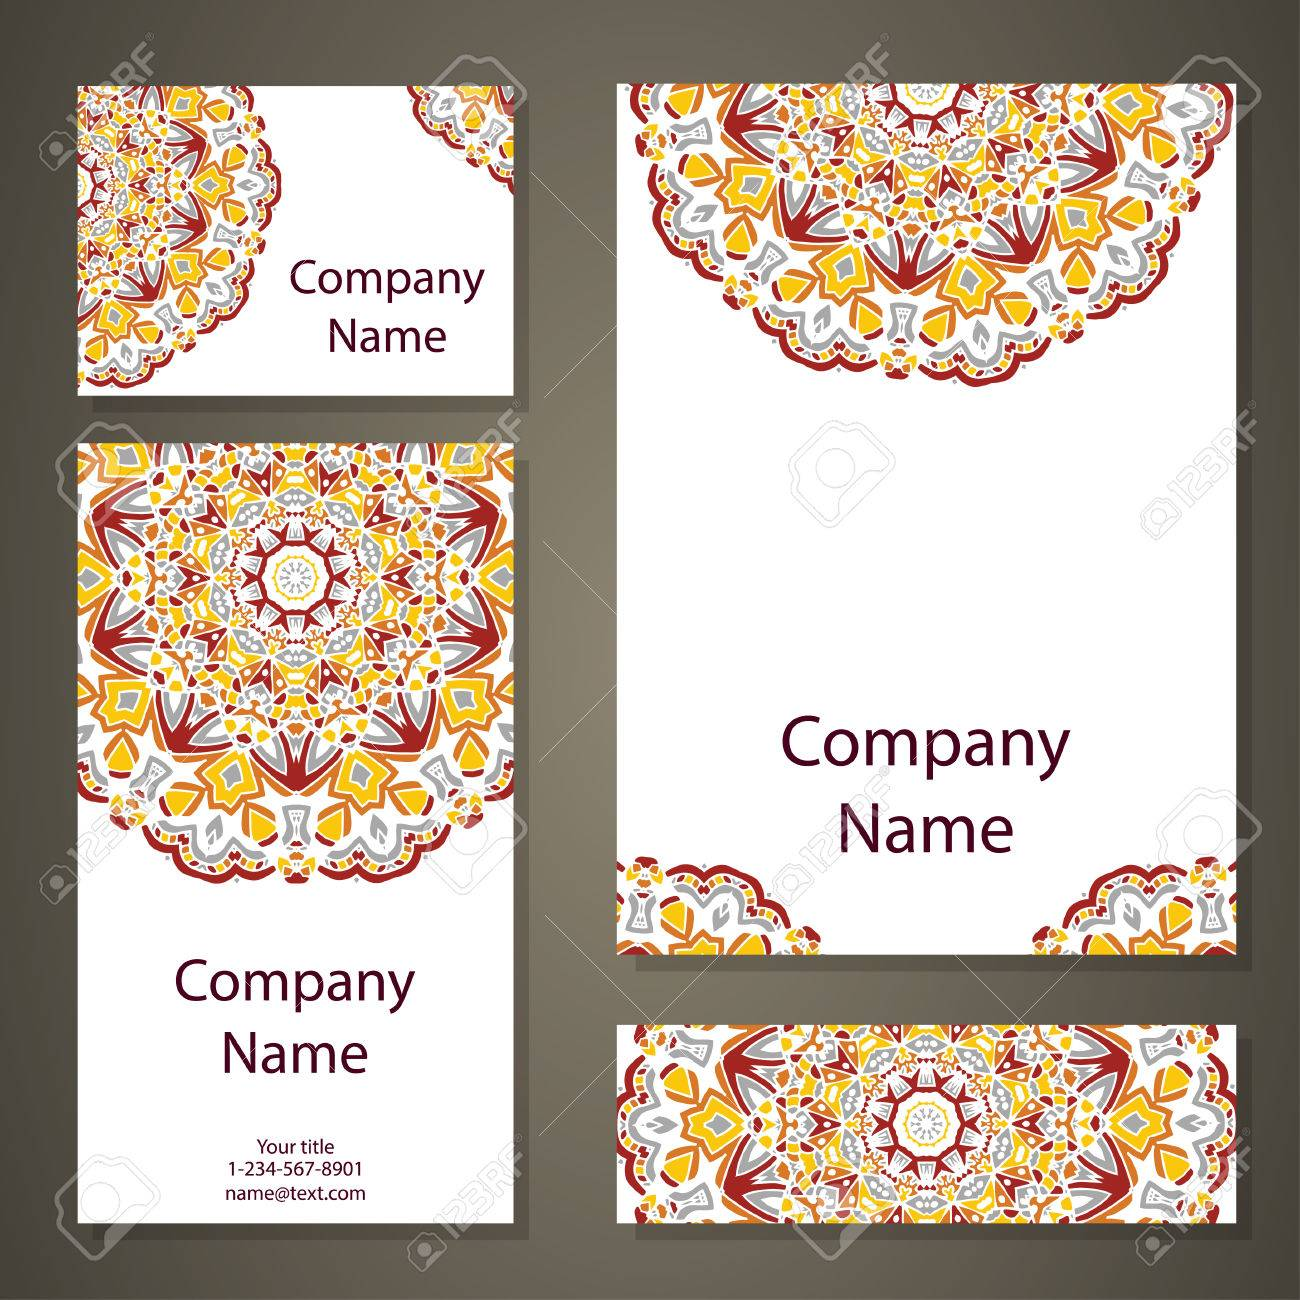 Vector Template Business Card Geometric Background Vintage Decorative Elements Islam Arabic